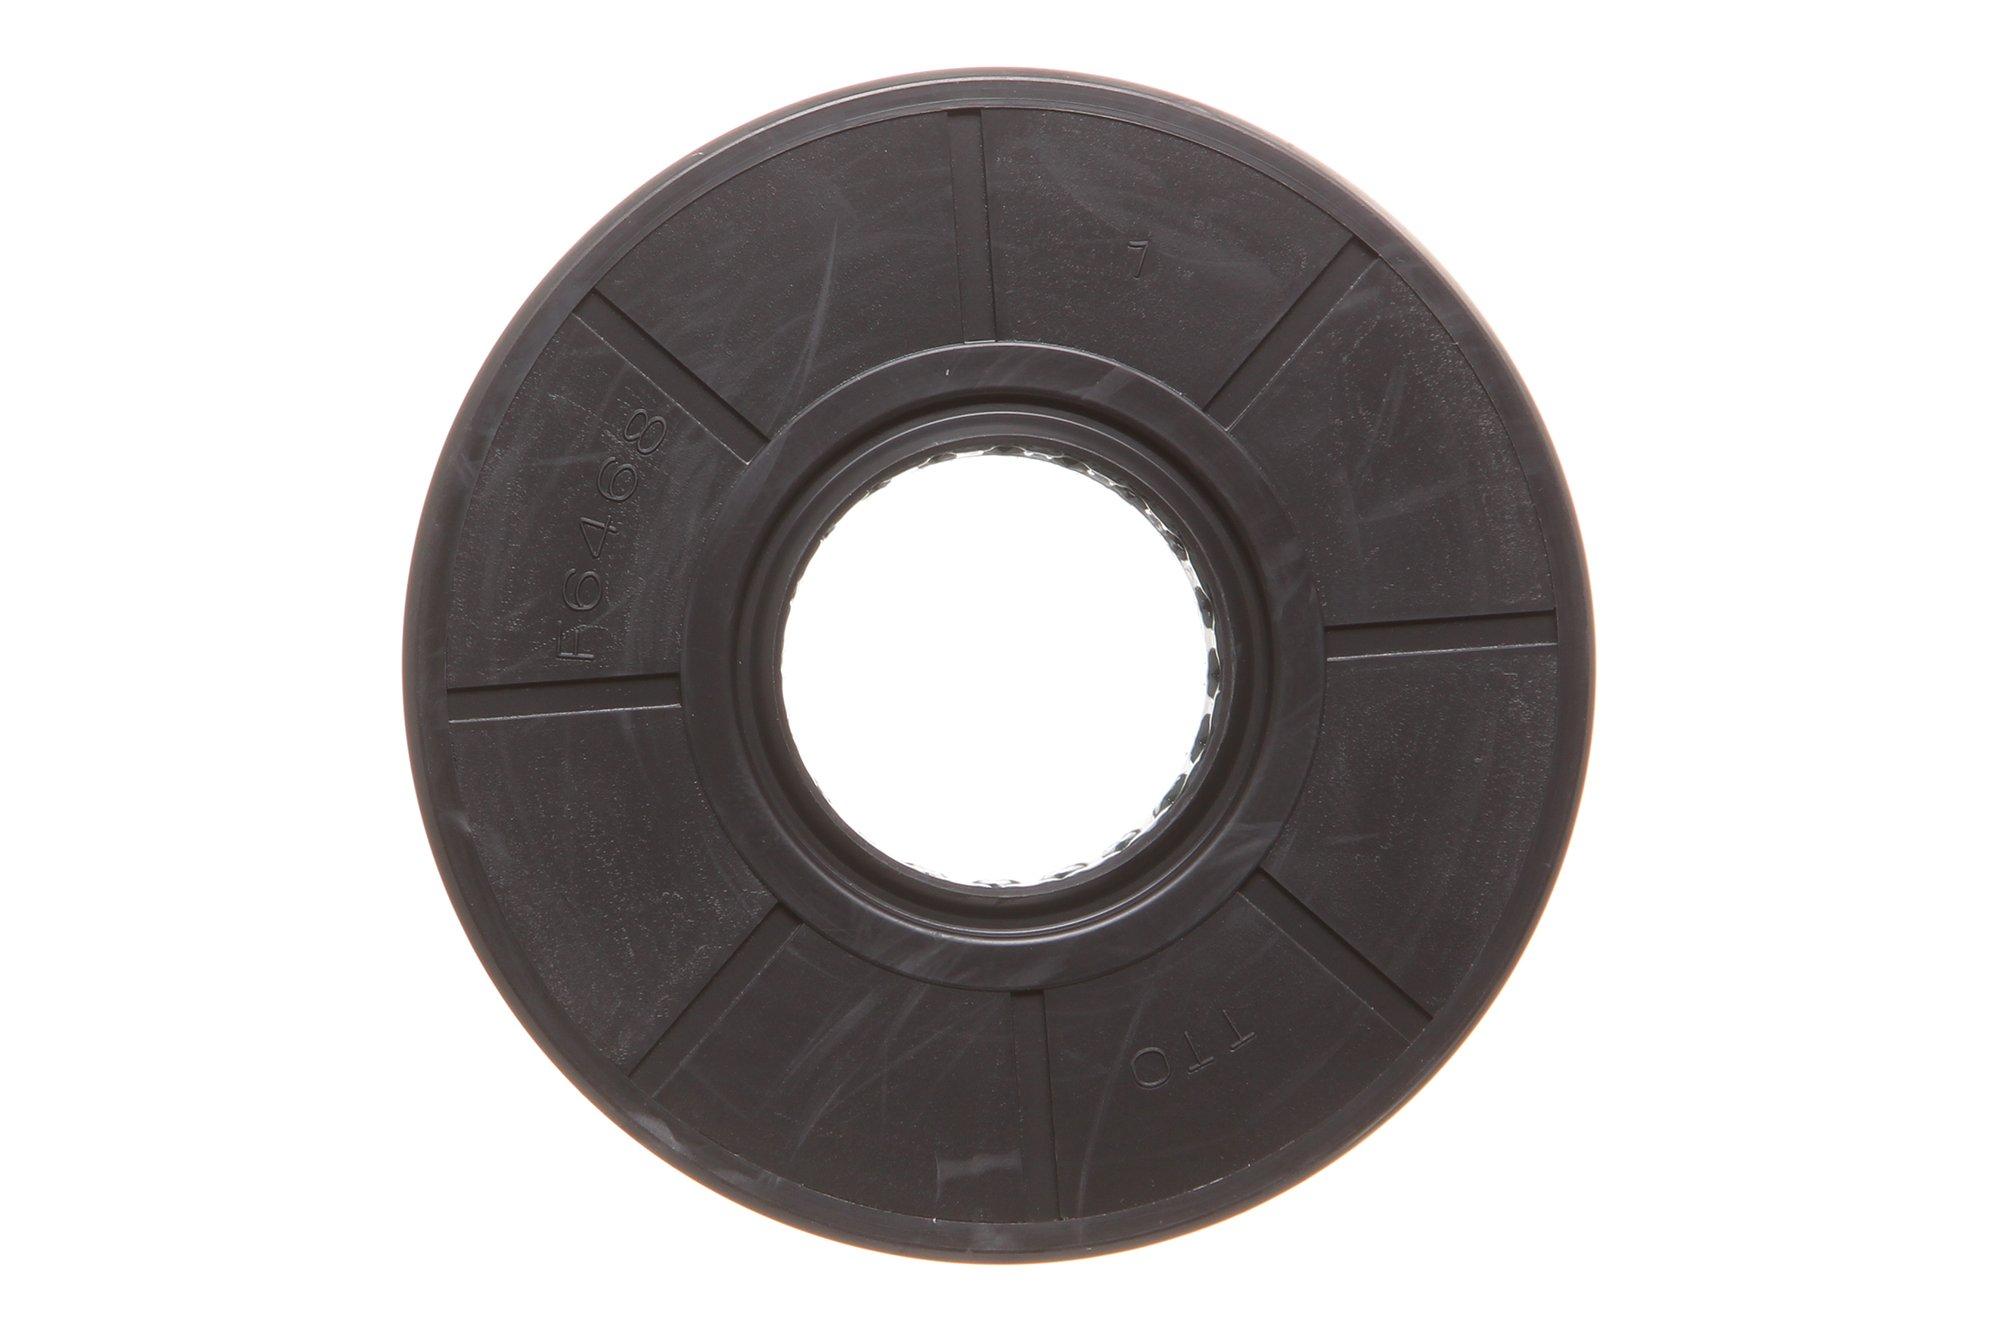 Polaris RZR 800 4 & S Rear Differential Pinon Seal Replaces 3610102 2008-2014